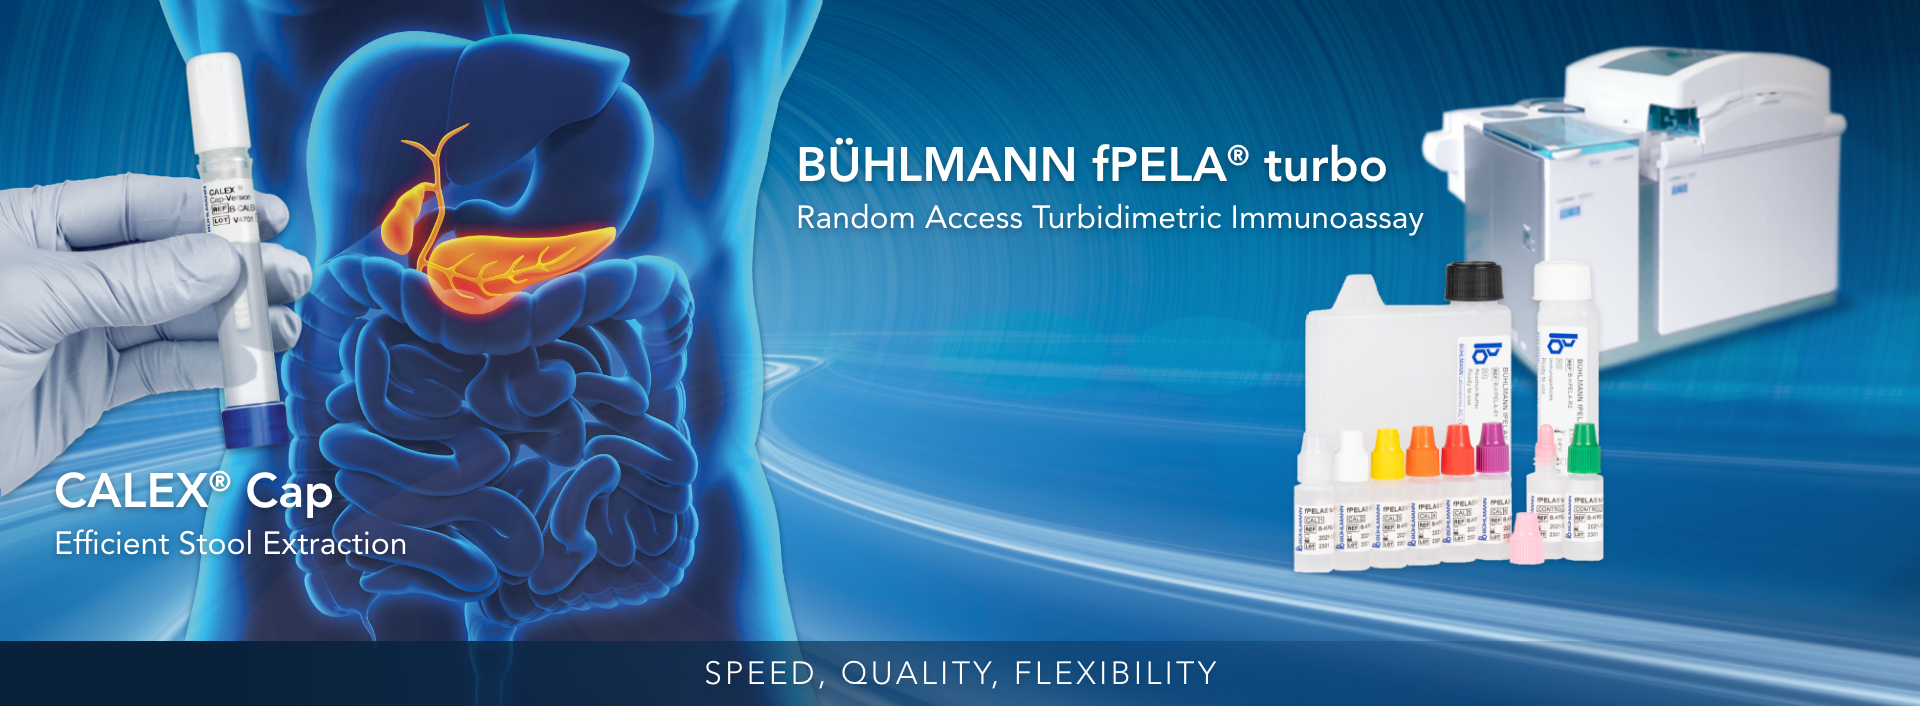 BÜHLMANN Laboratories AG Launches New fPELA® turbo Automated, Random Access Pancreatic Elastase Test